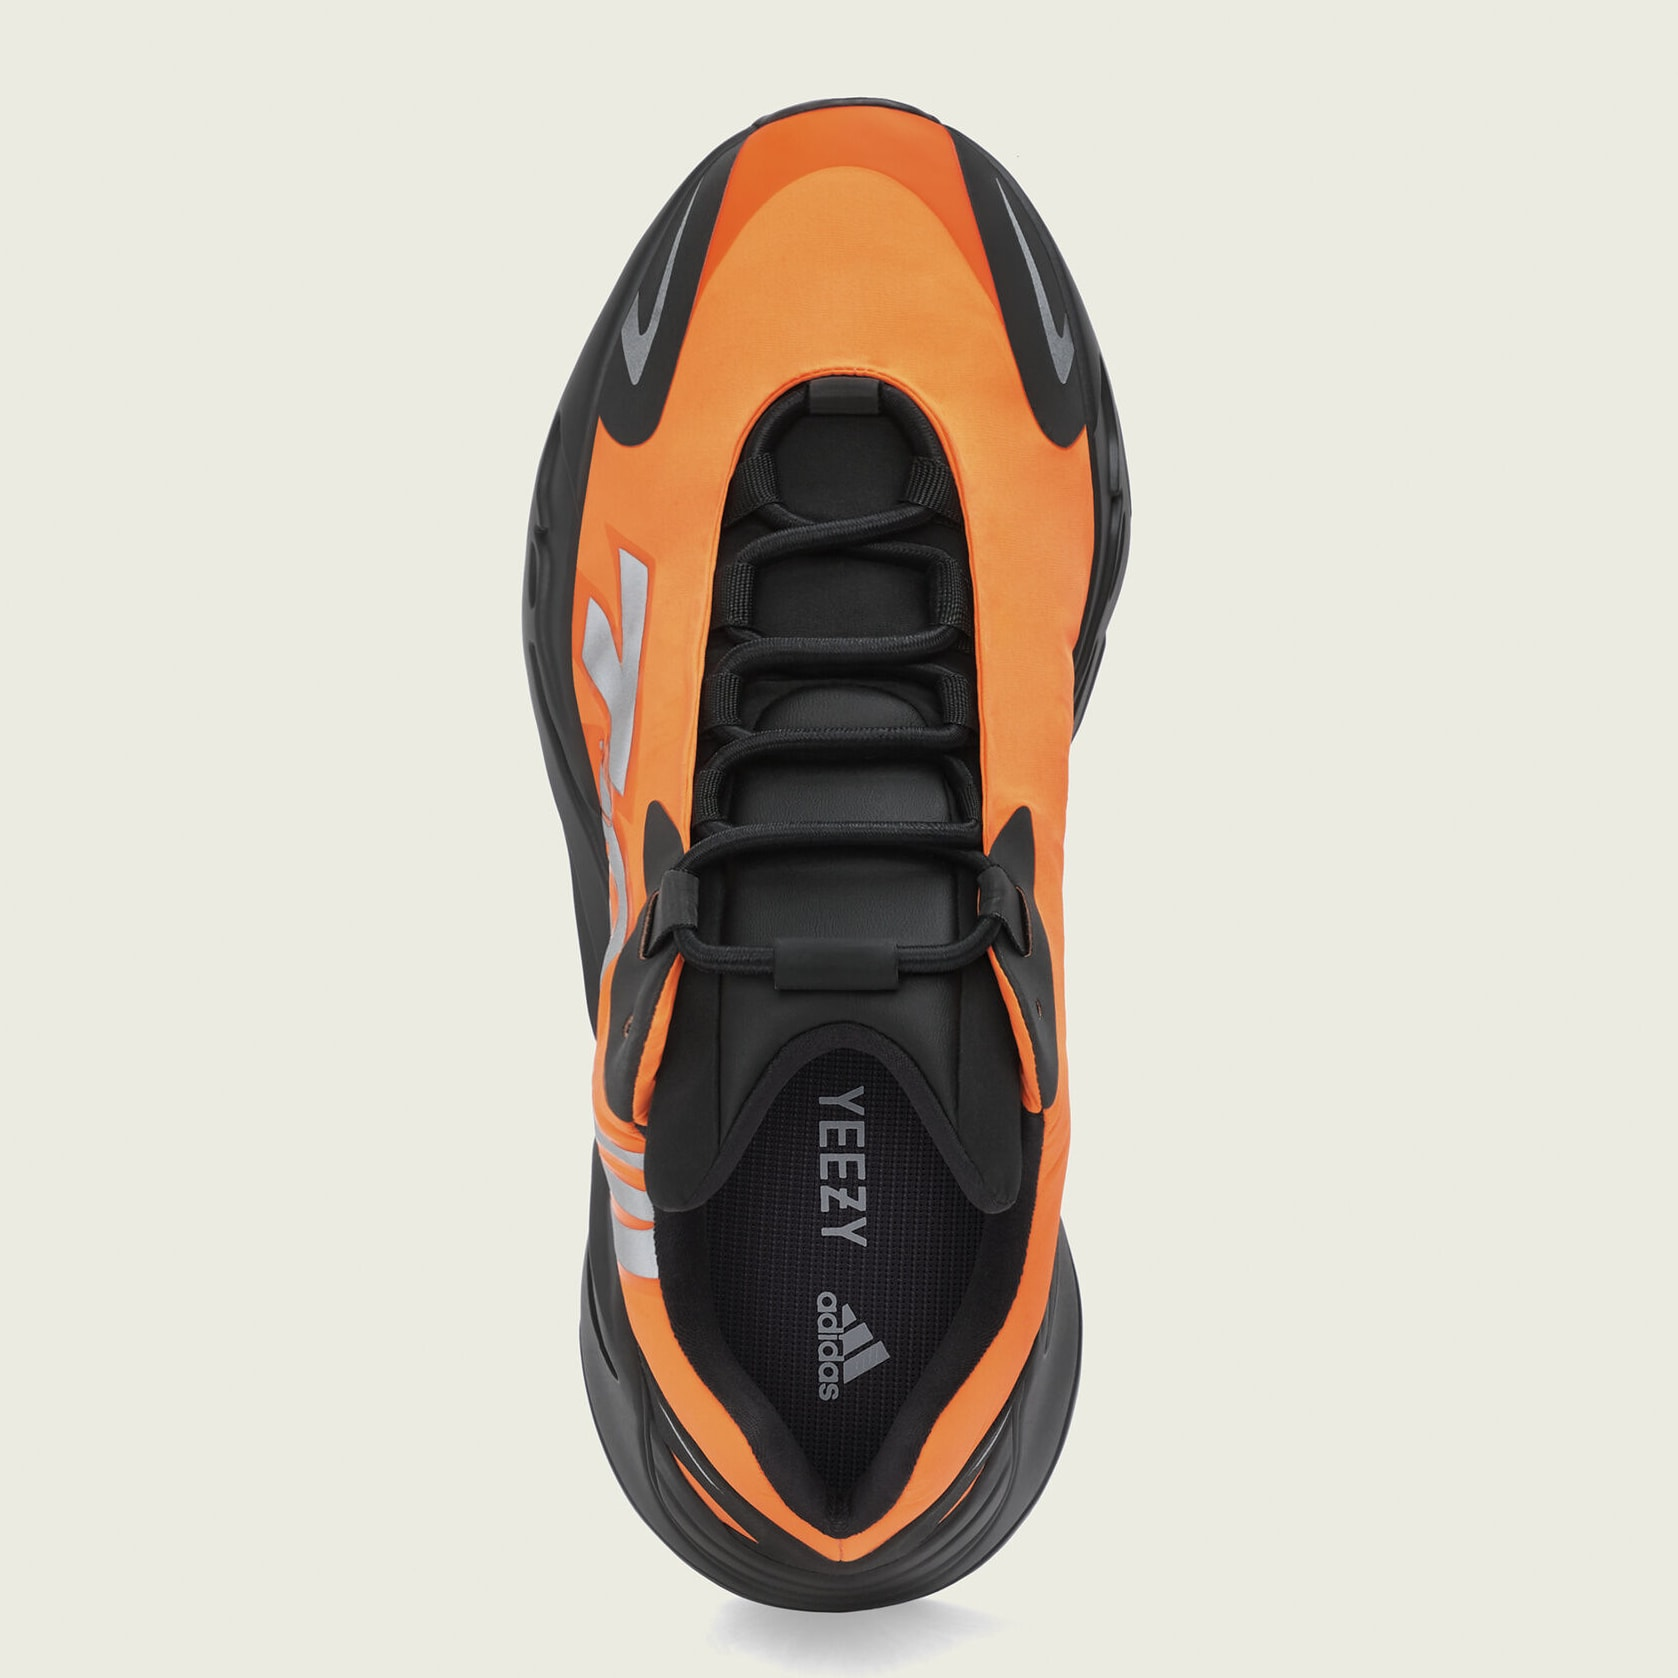 adidas-yeezy-boost-700-mnvn-orange-fv3258-top